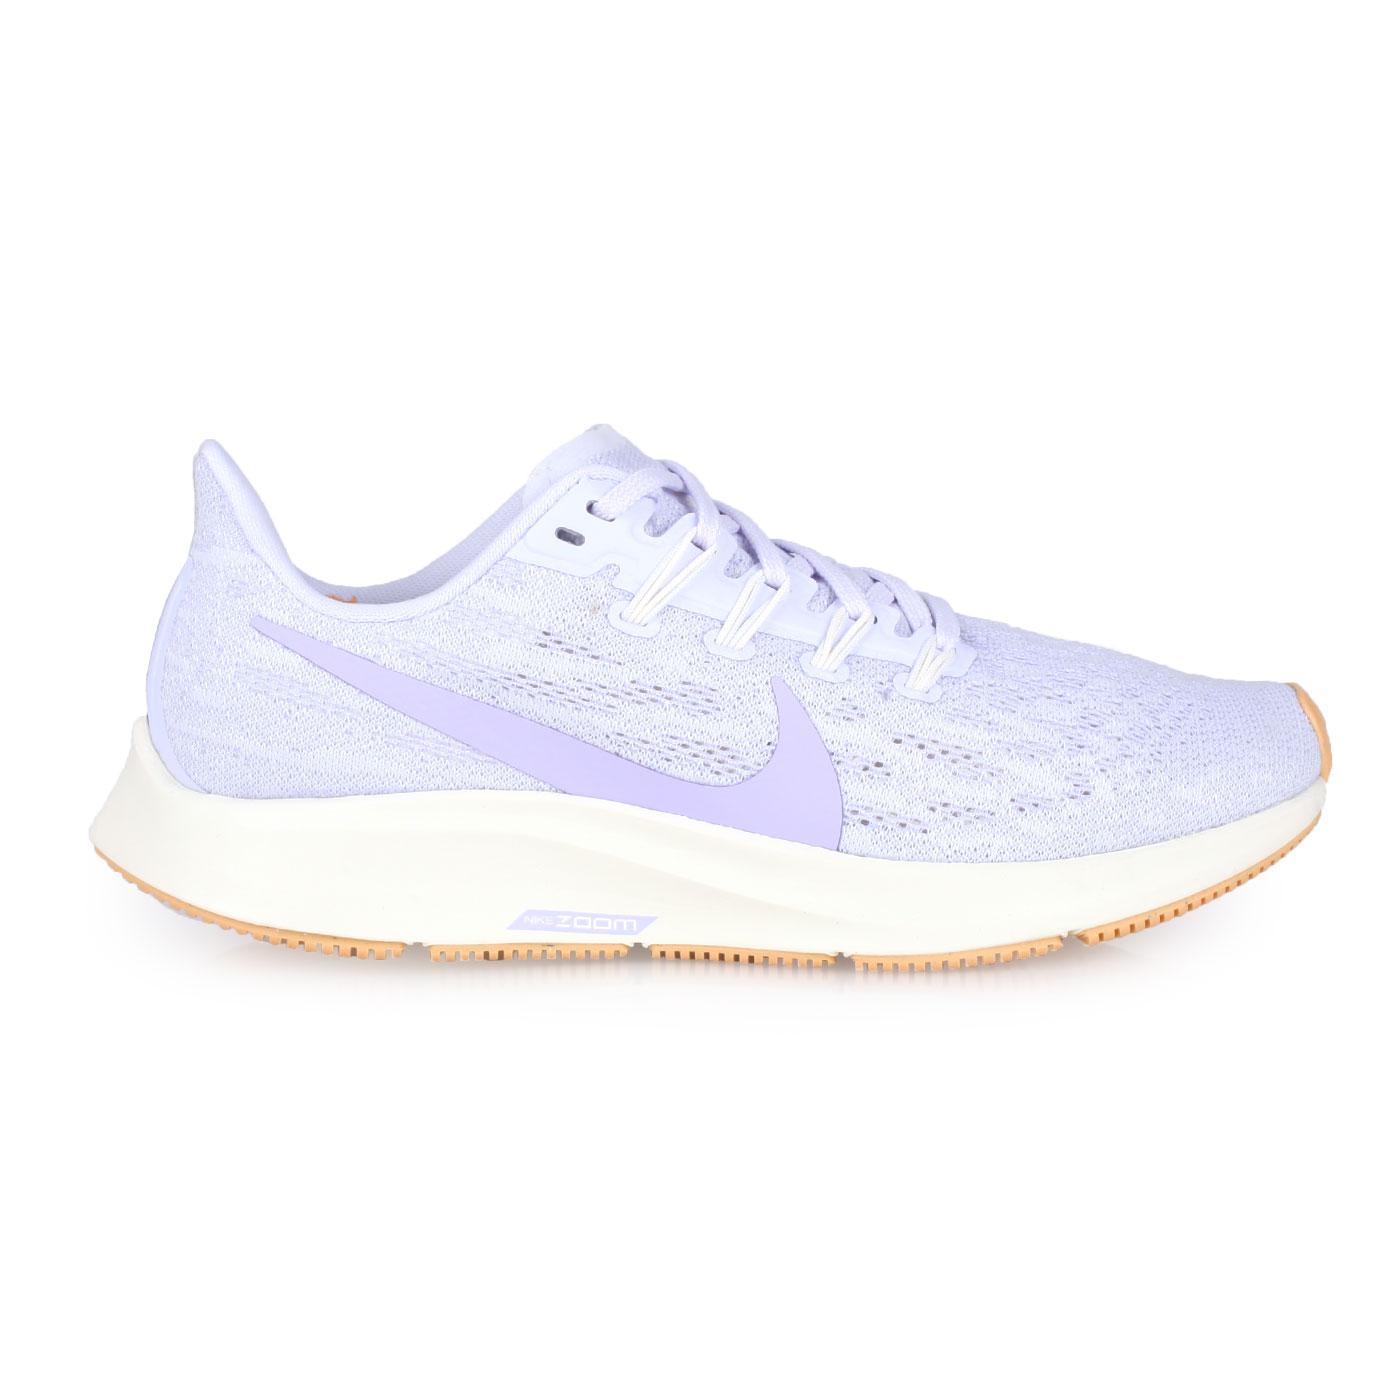 NIKE 女款慢跑鞋  @WMNS AIR ZOOM PEGASUS 36@AQ2210005 - 紫黃